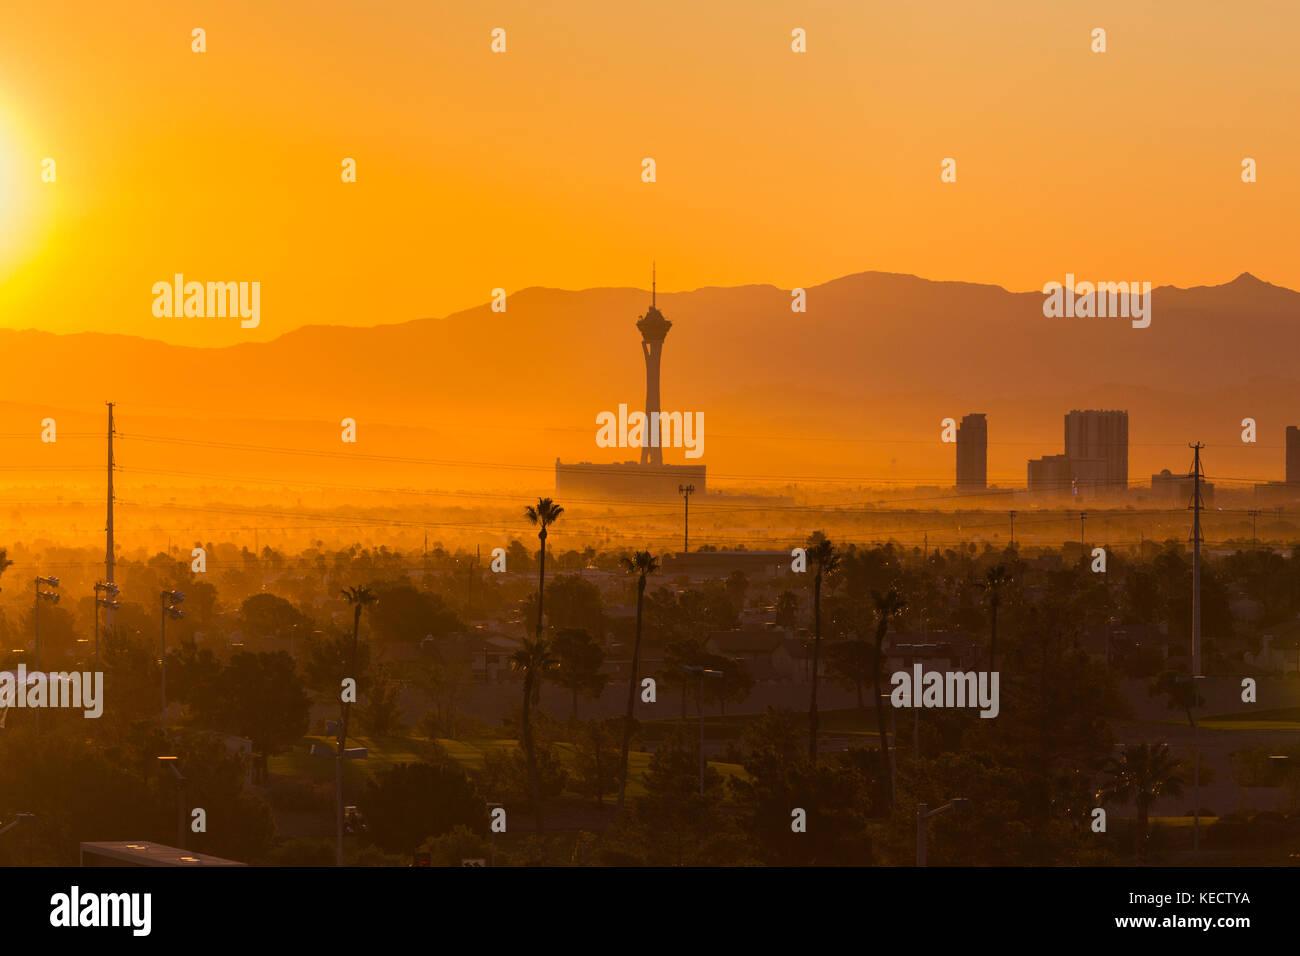 Las Vegas, Nevada, USA - October 10, 2017:  Hazy morning sunrise view towards Stratosphere tower on the Las Vegas - Stock Image